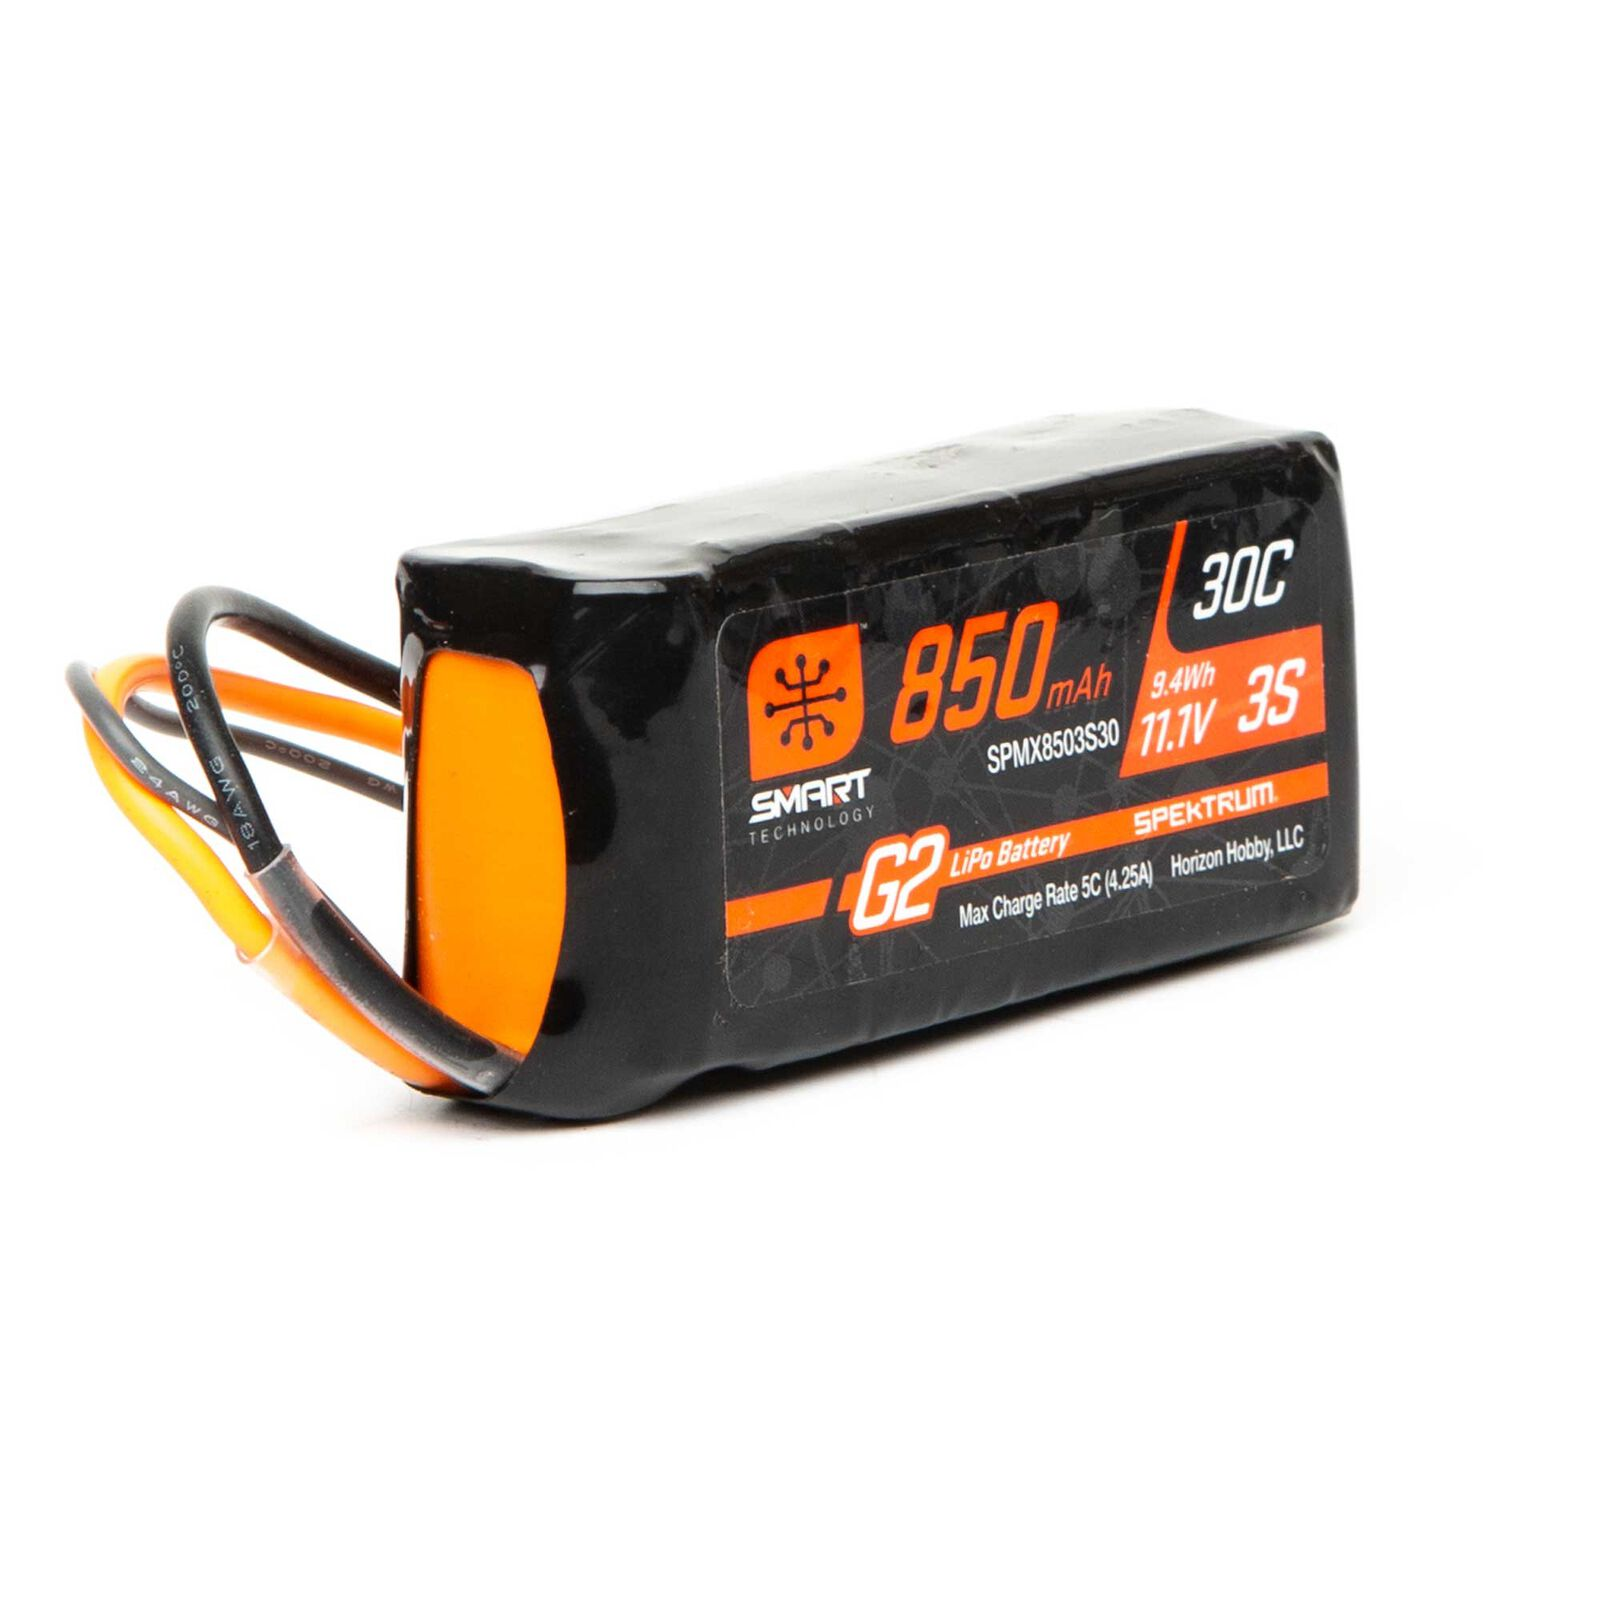 11.1V 850mAh 3S 30C Smart G2 LiPo Battery: IC2